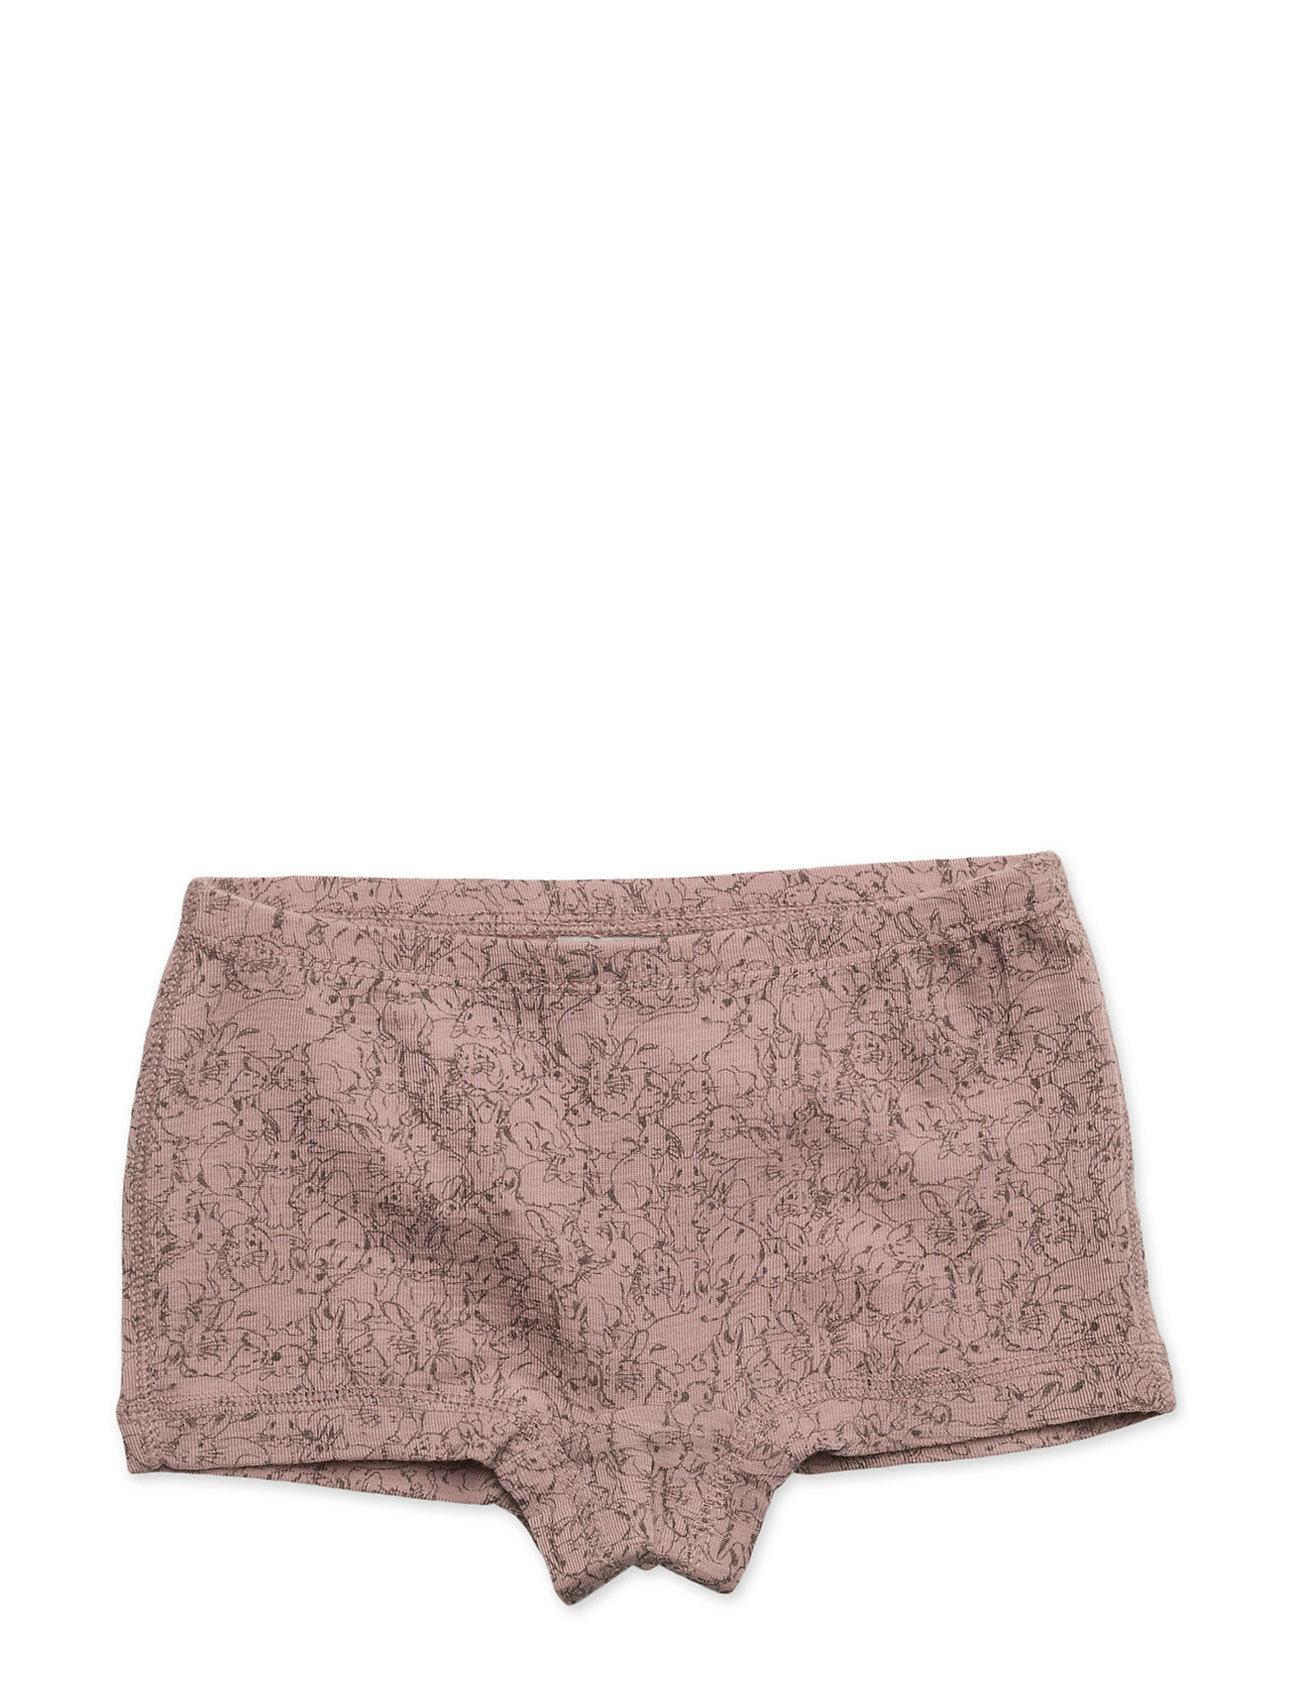 Girls Wool Panties Wheat Undertøj til Børn i